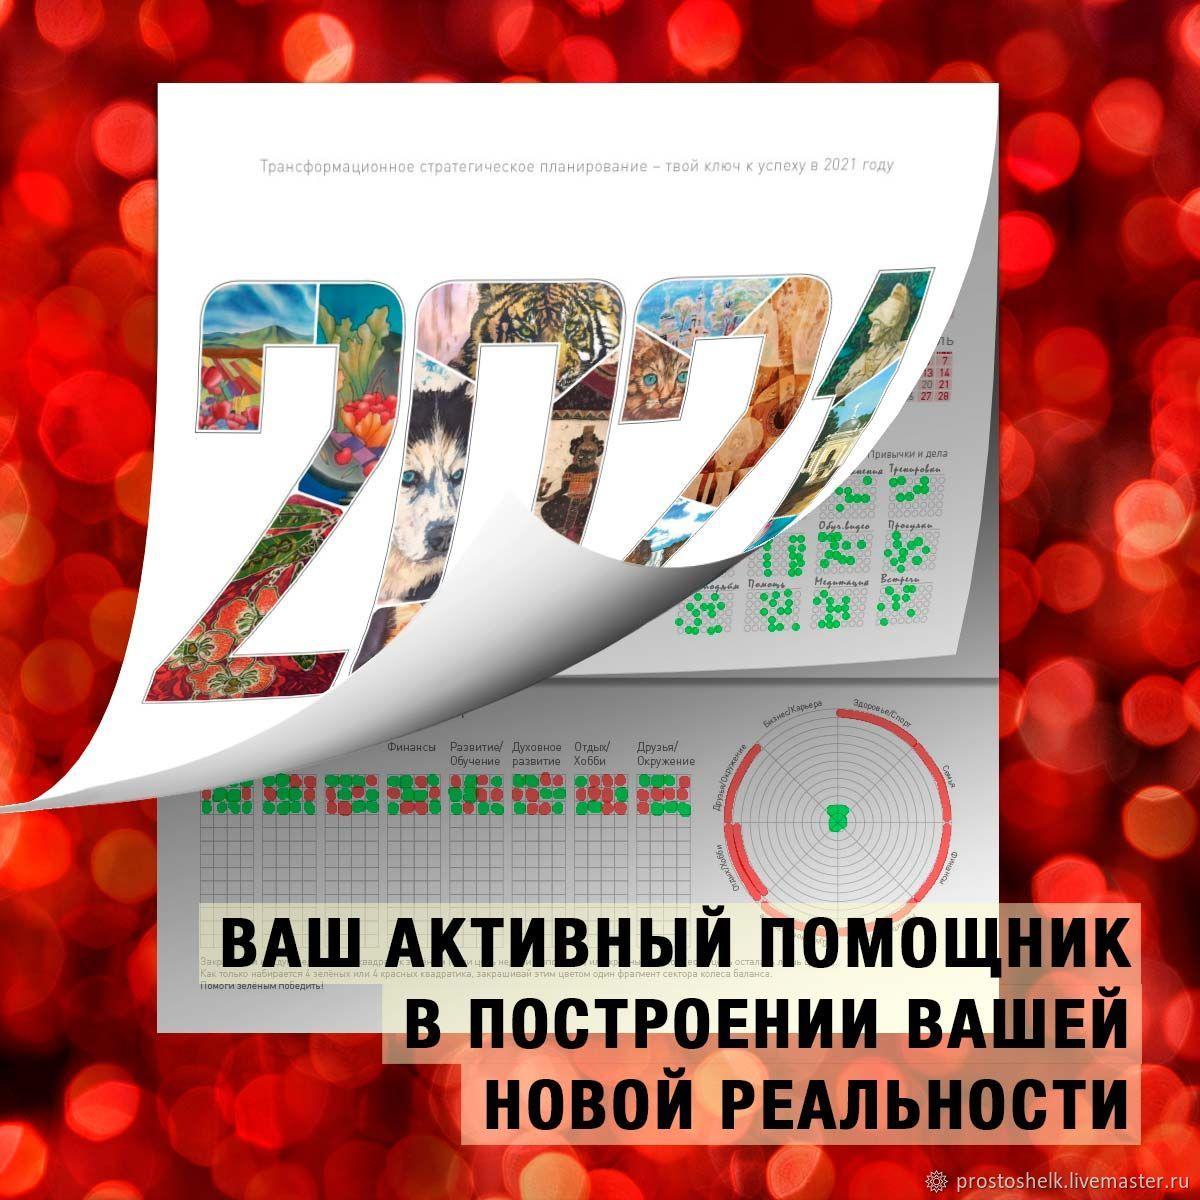 Creative calendar for strategic planning, Calendars, Moscow,  Фото №1